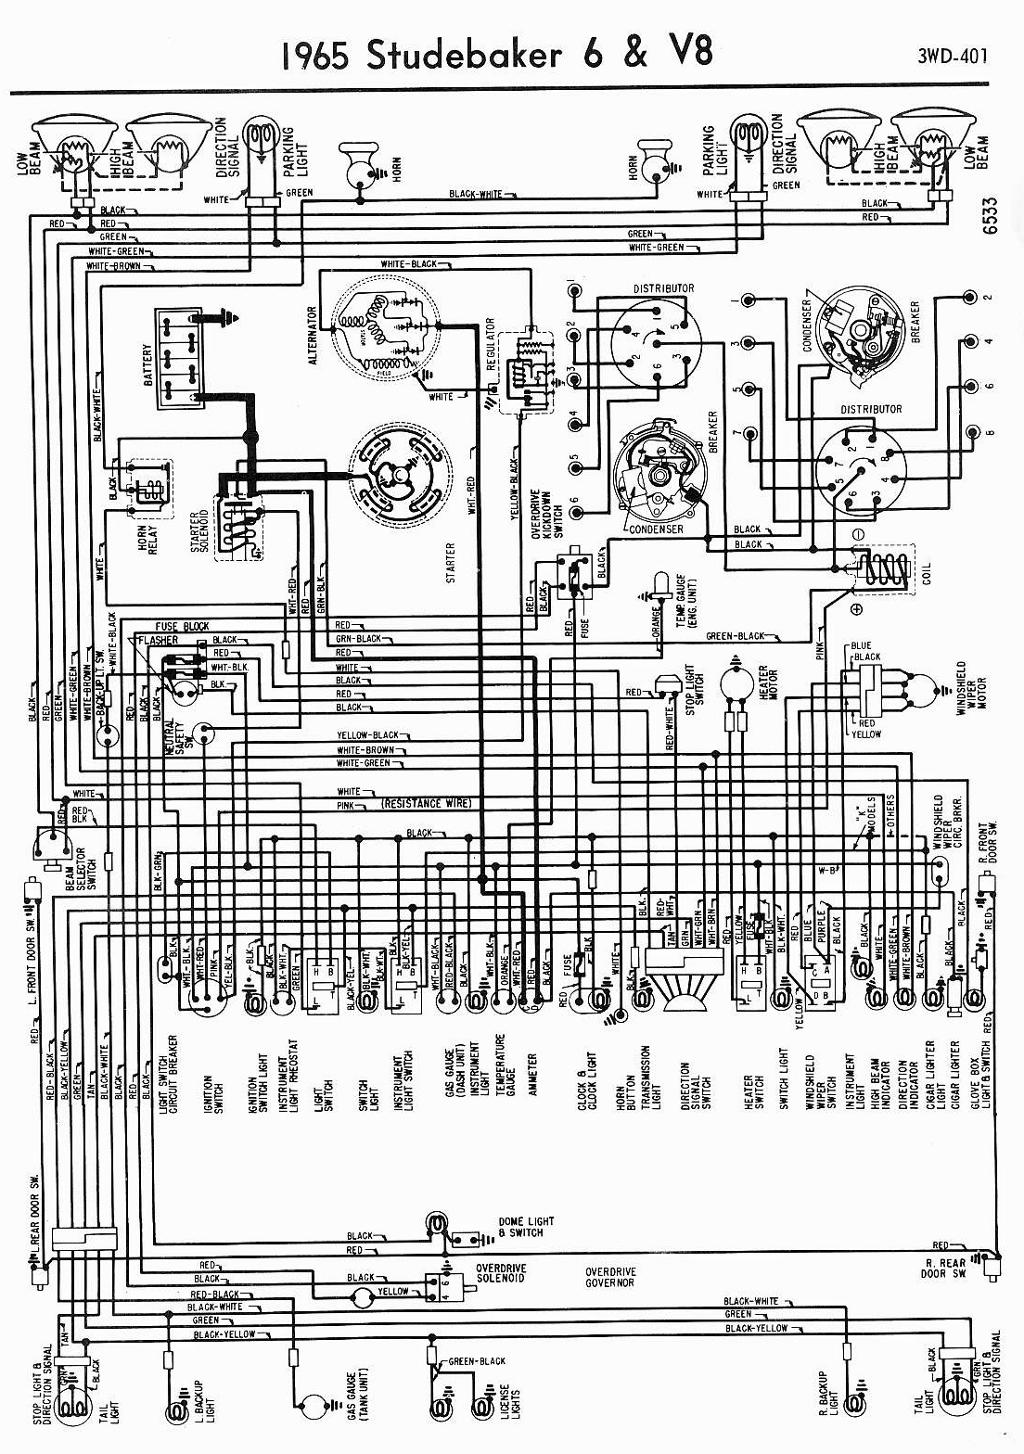 1965 Triumph Spitfire Wiring Diagram Schematic Diagrams 1973 Tr6 Mkii Trusted